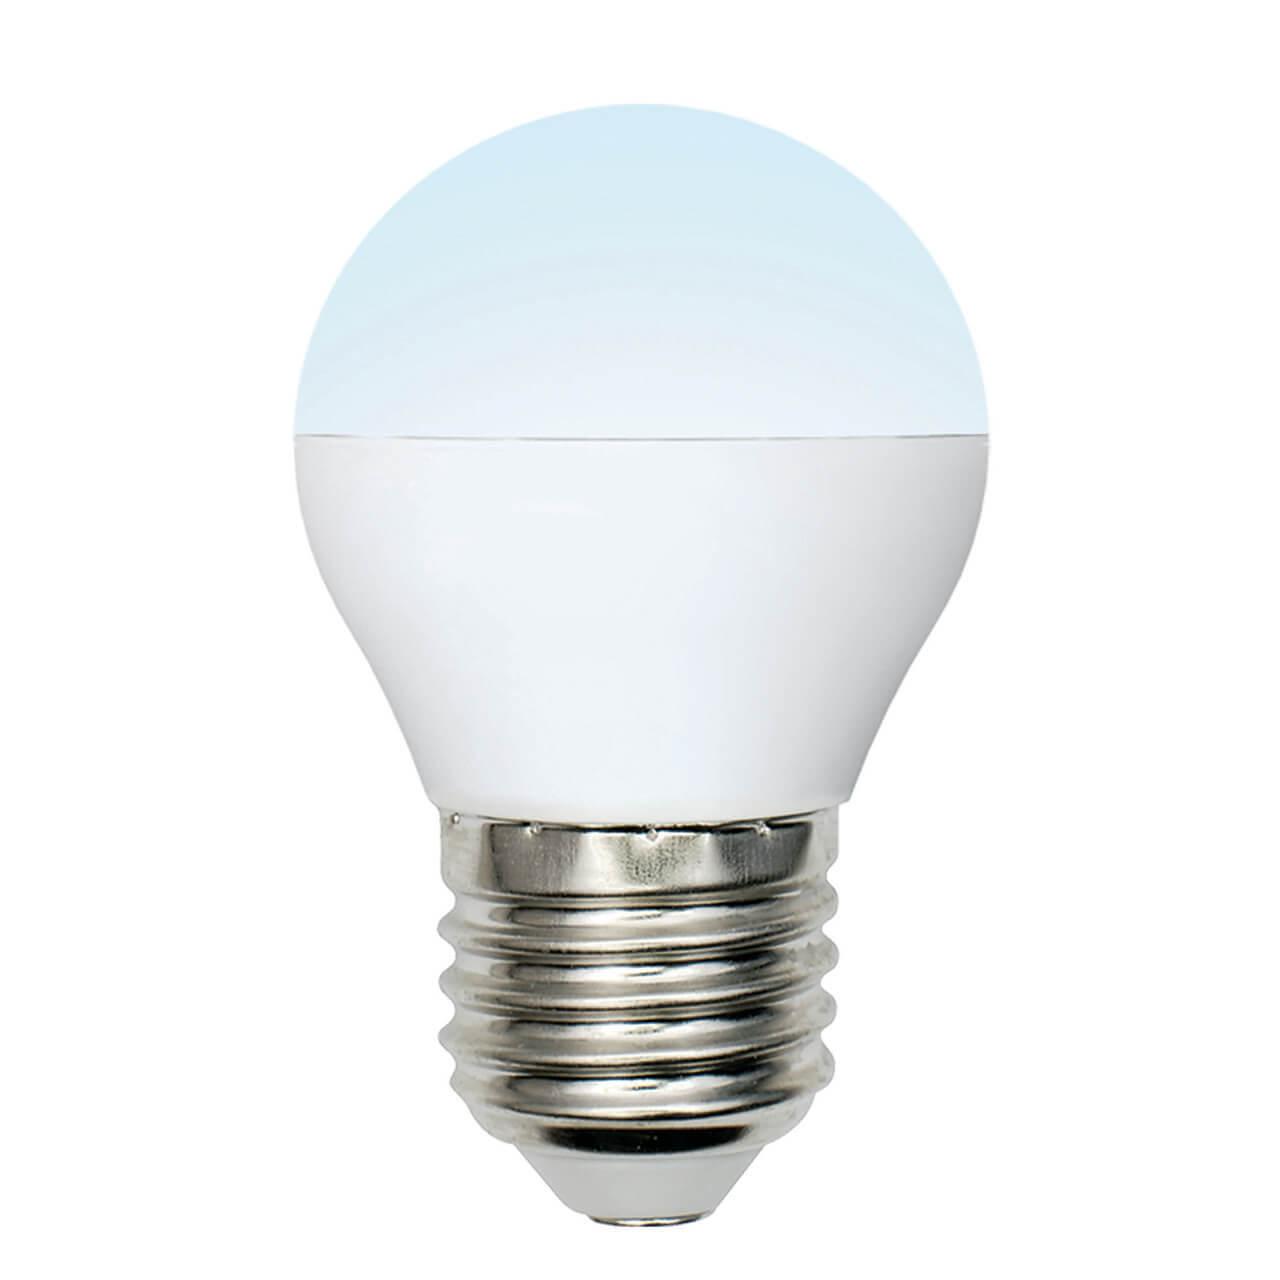 Лампочка Uniel LED-G45-6W/NW/E27/FR/MB PLM11WH Multibright G фото